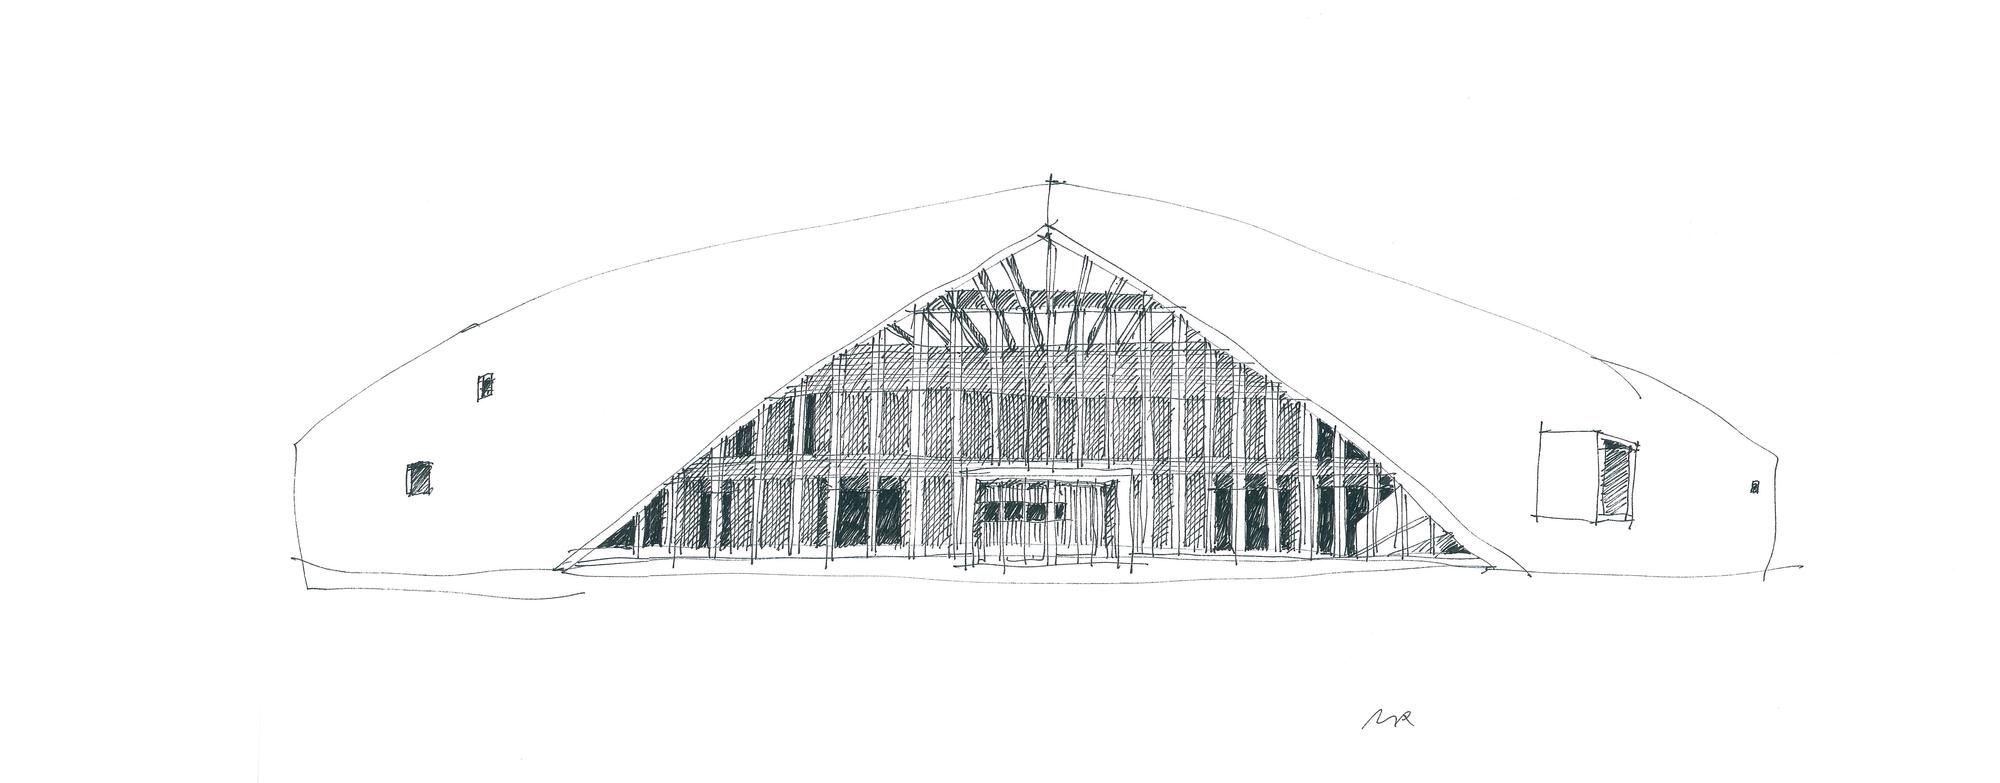 http://ad009cdnb.archdaily.net/wp-content/uploads/2013/11/51314454b3fc4b0d98001450_carlos-santa-mar-a-center-jaam-sociedad-de-arquitectura_1337622125-jaam-ccs-3.png